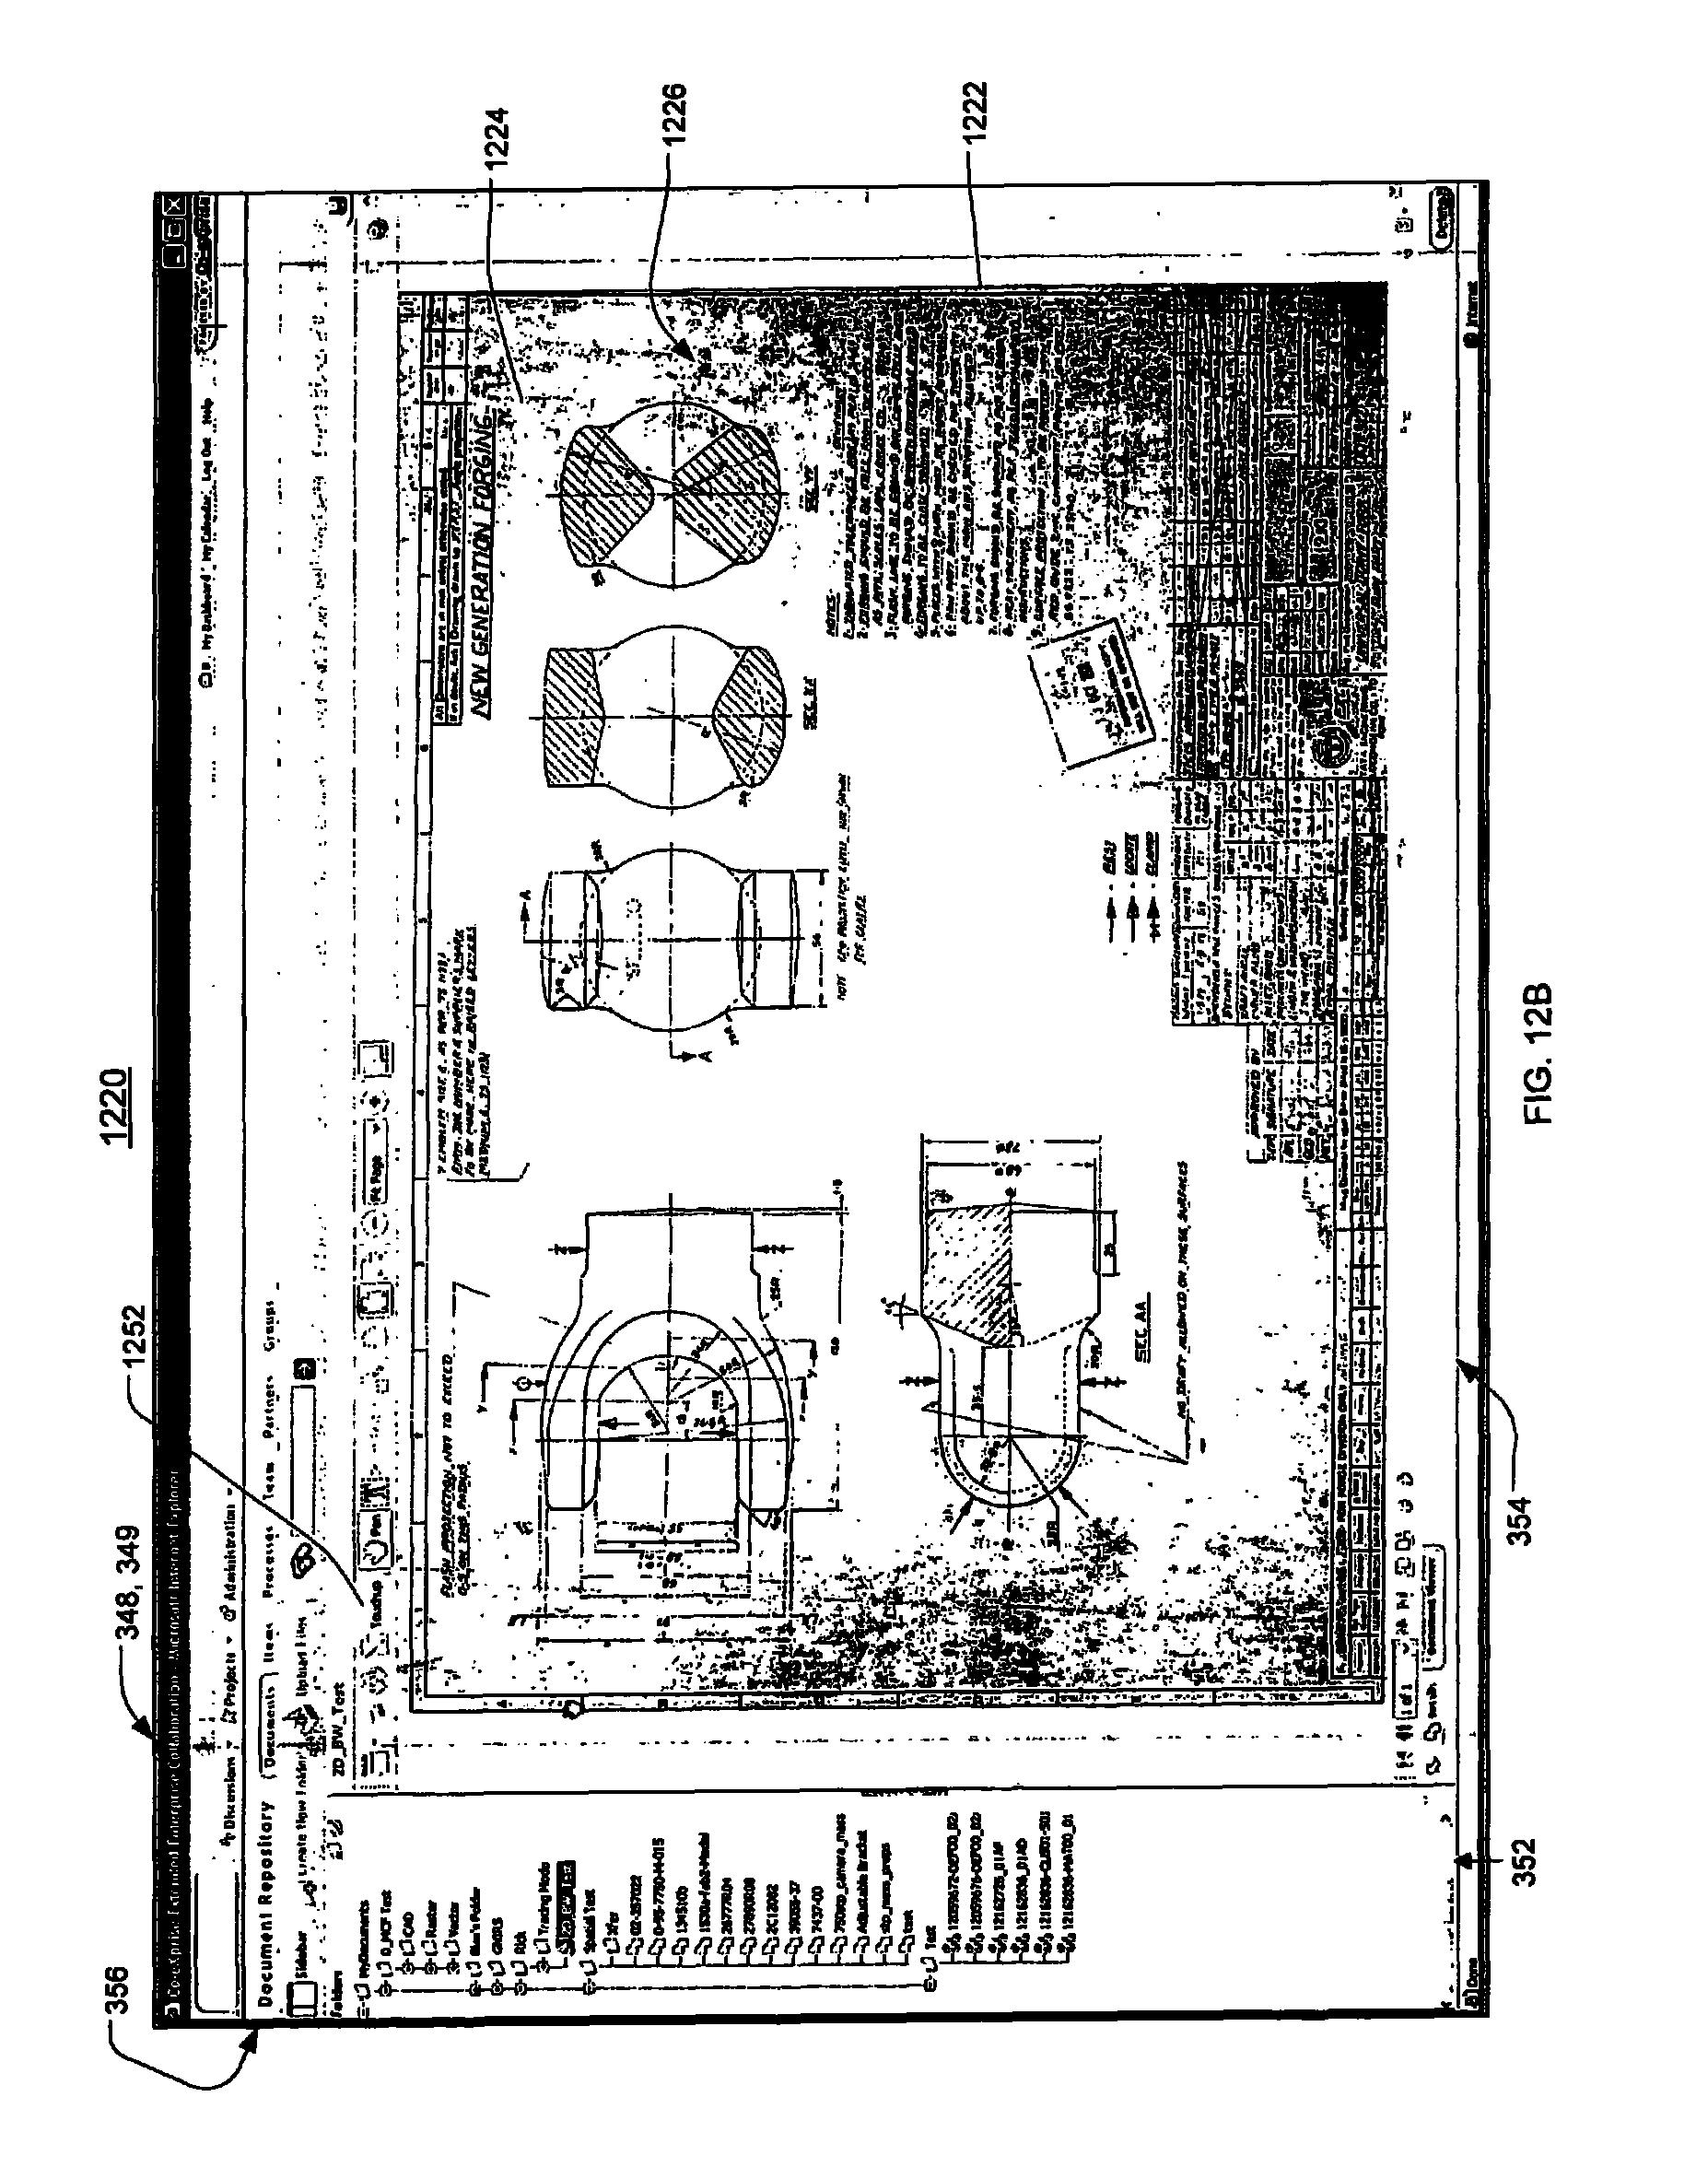 Patent Us 8712858 B2 Wiring Diagram 3 5 Mm Headphone Jack Gecko G540 Images